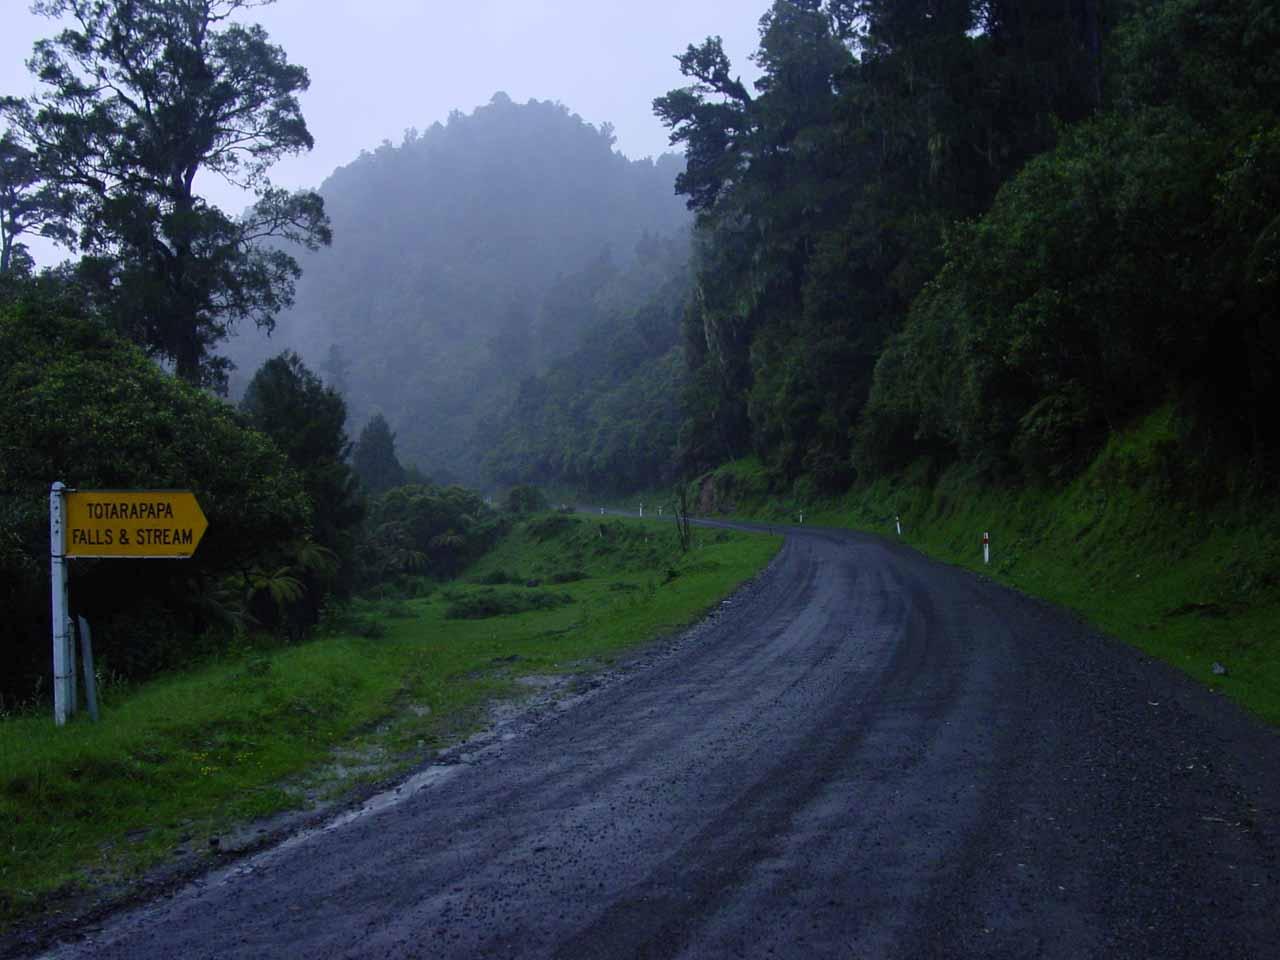 Sign for Totarapapa Falls and Stream